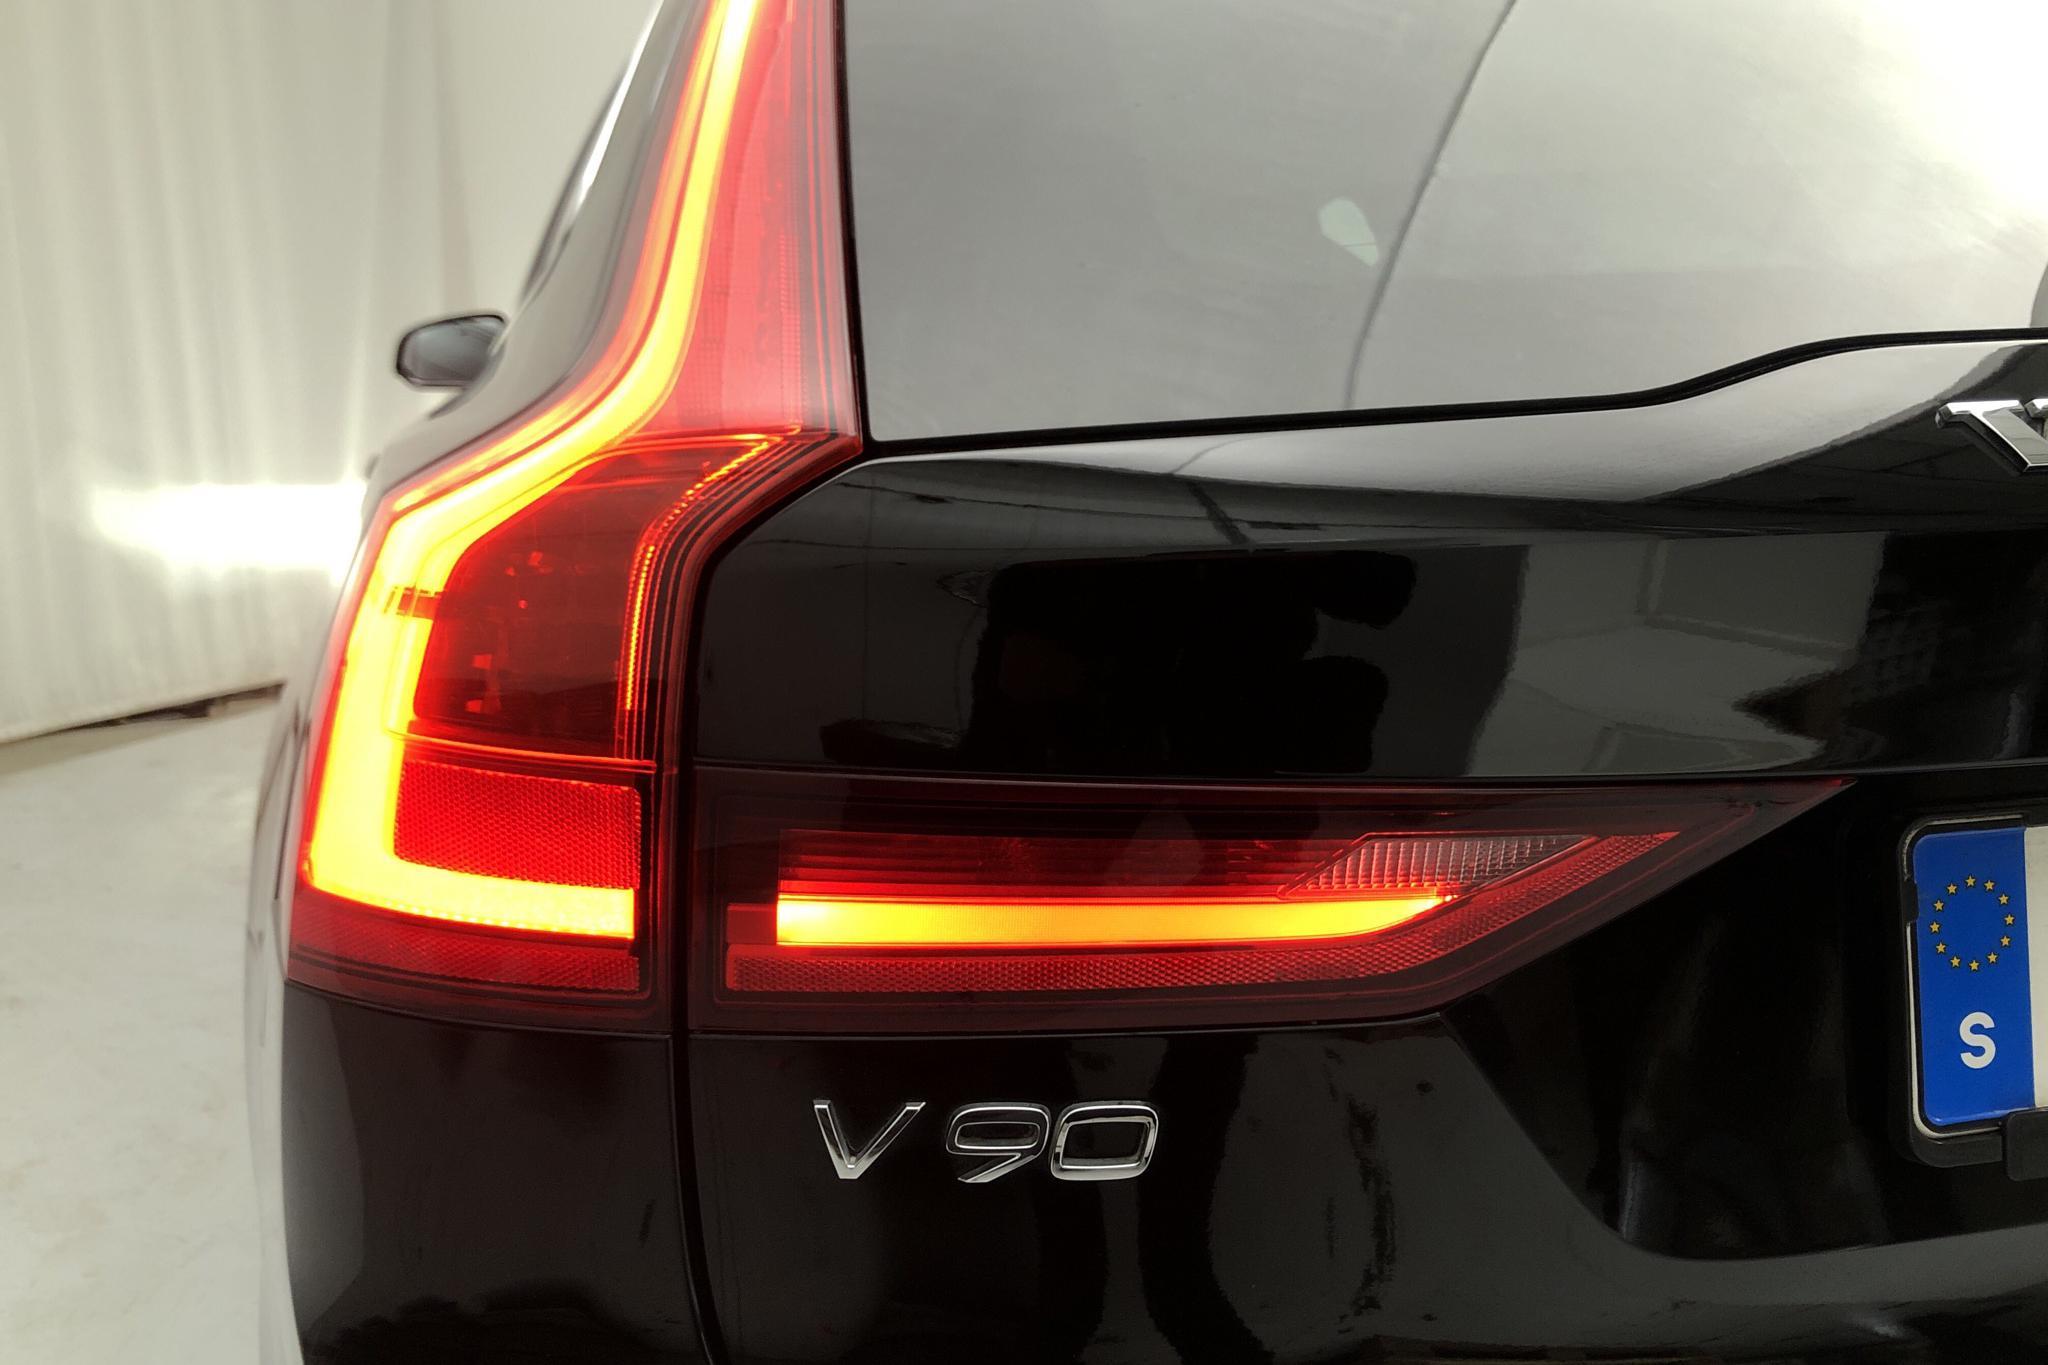 Volvo V90 T5 (250hk) - 106 820 km - Automatic - black - 2019